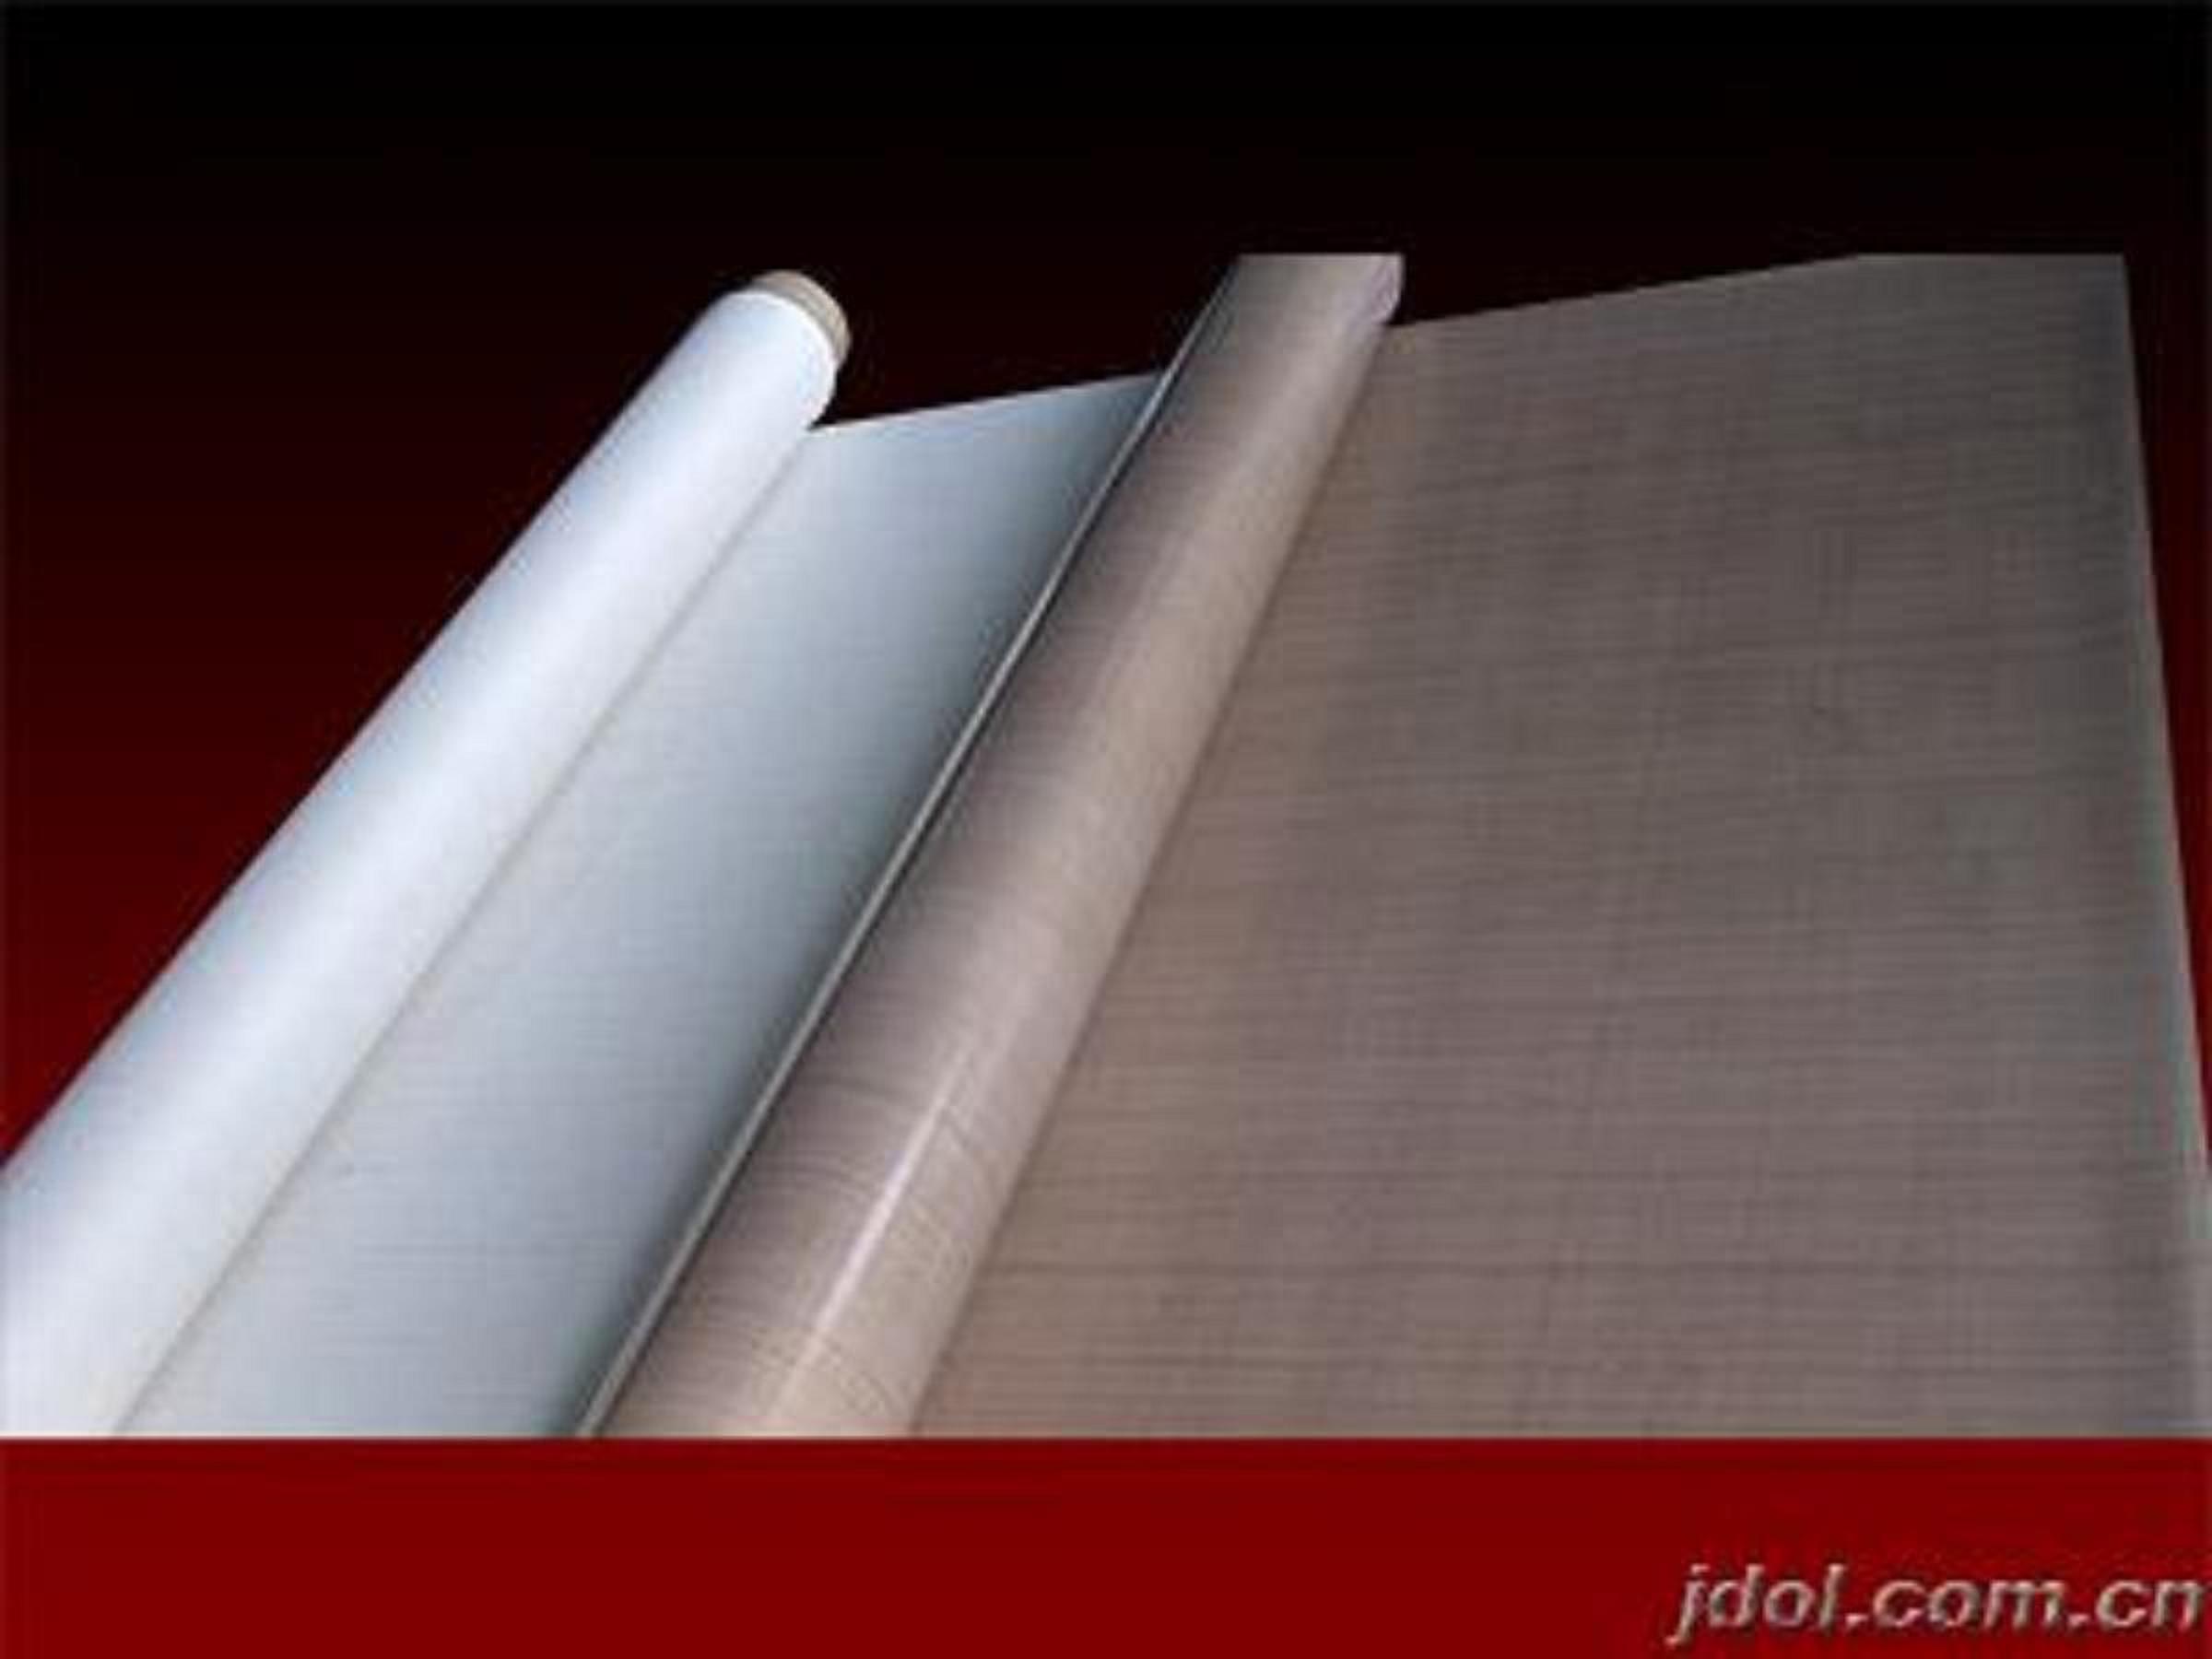 PTFE high temperature cloth-Silica cloth | Teflon tape